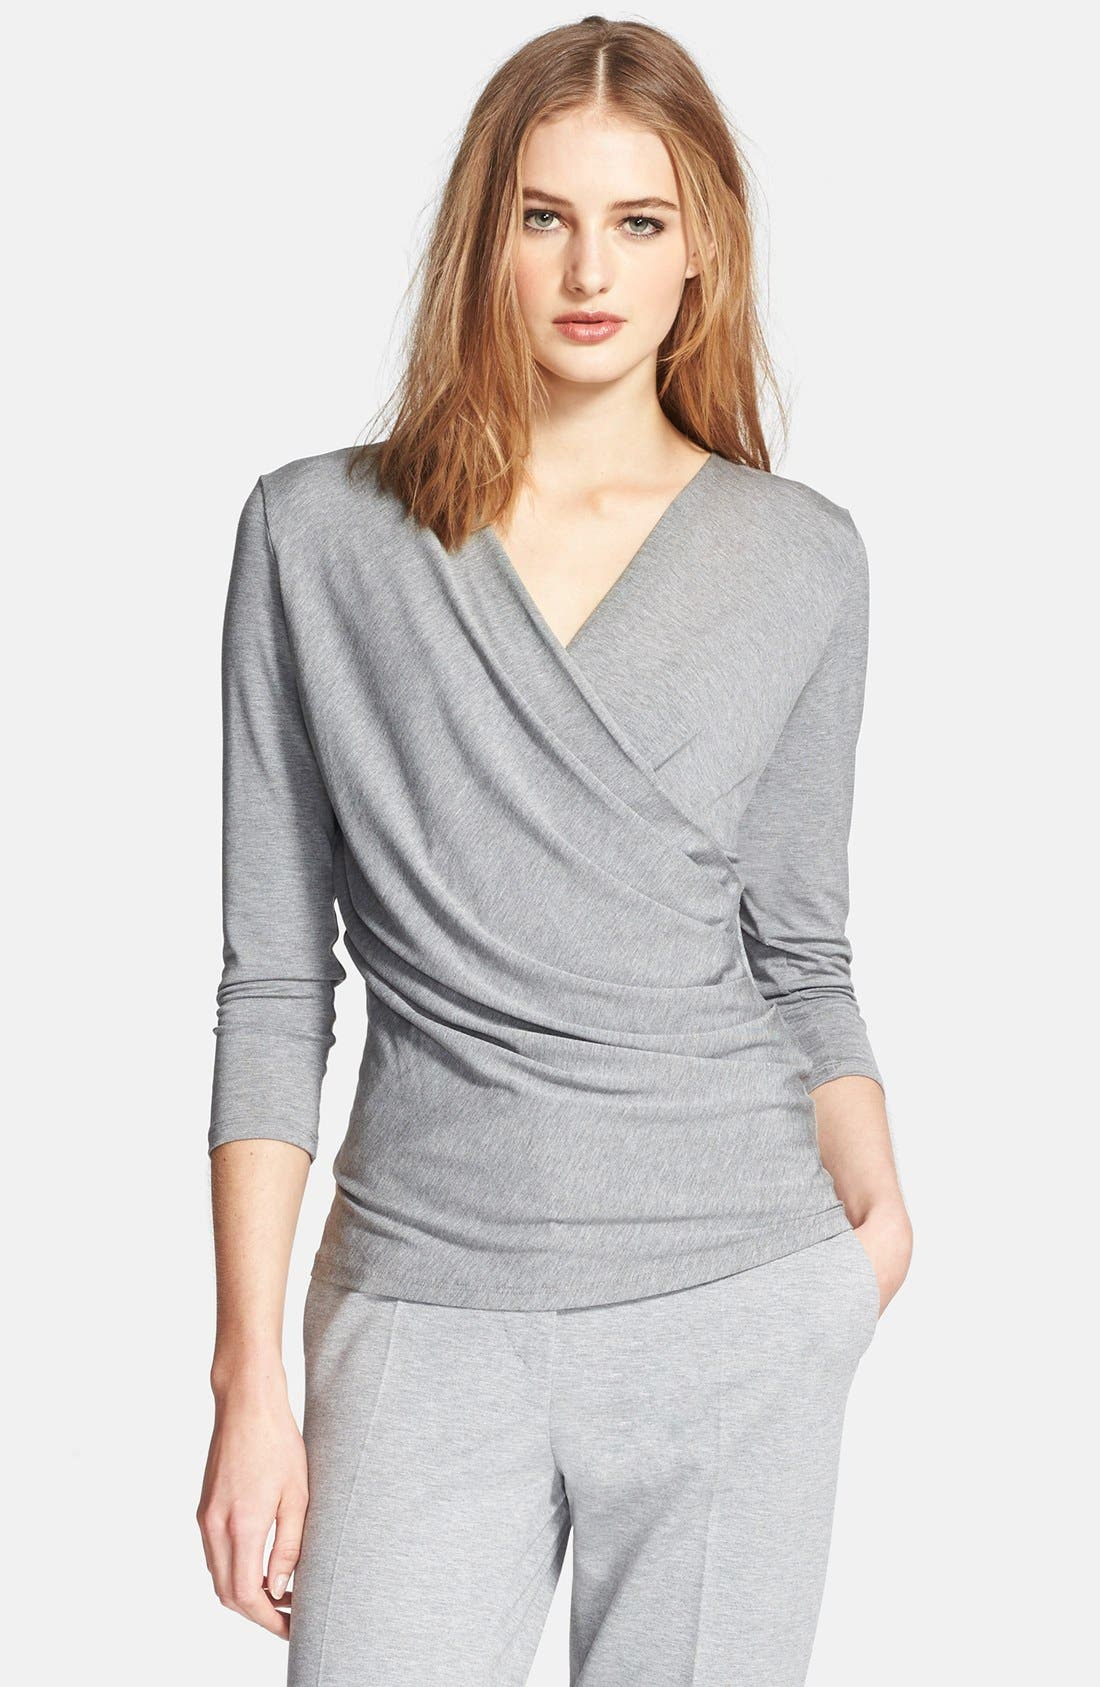 Main Image - Max Mara 'Caprice' Faux Wrap Jersey Top